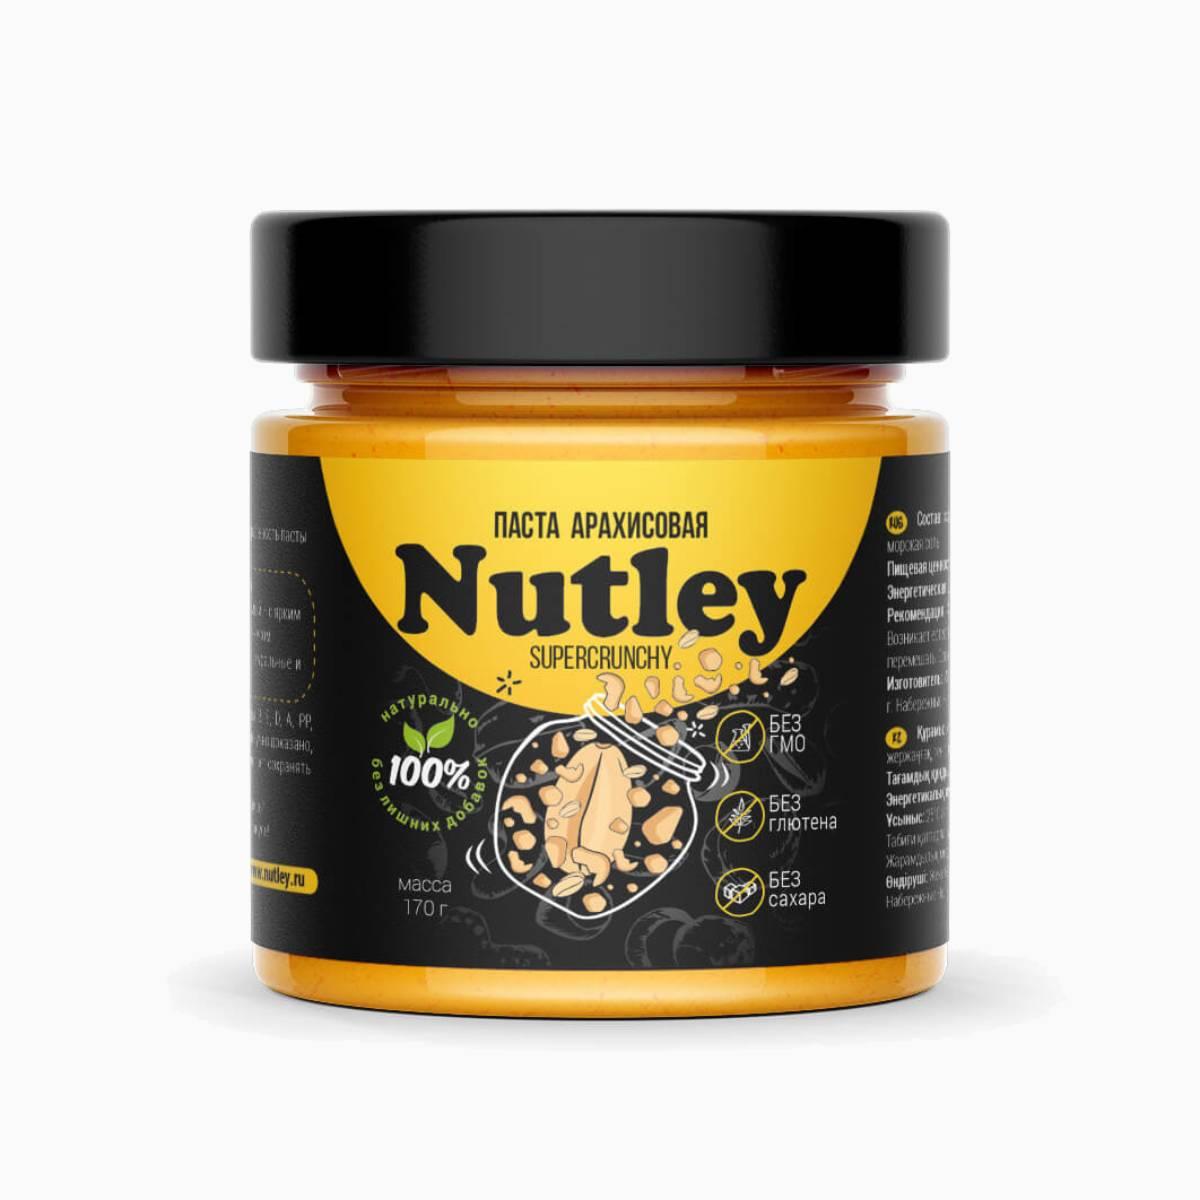 Паста Арахисовая SuperCrunchy, Nutley Black